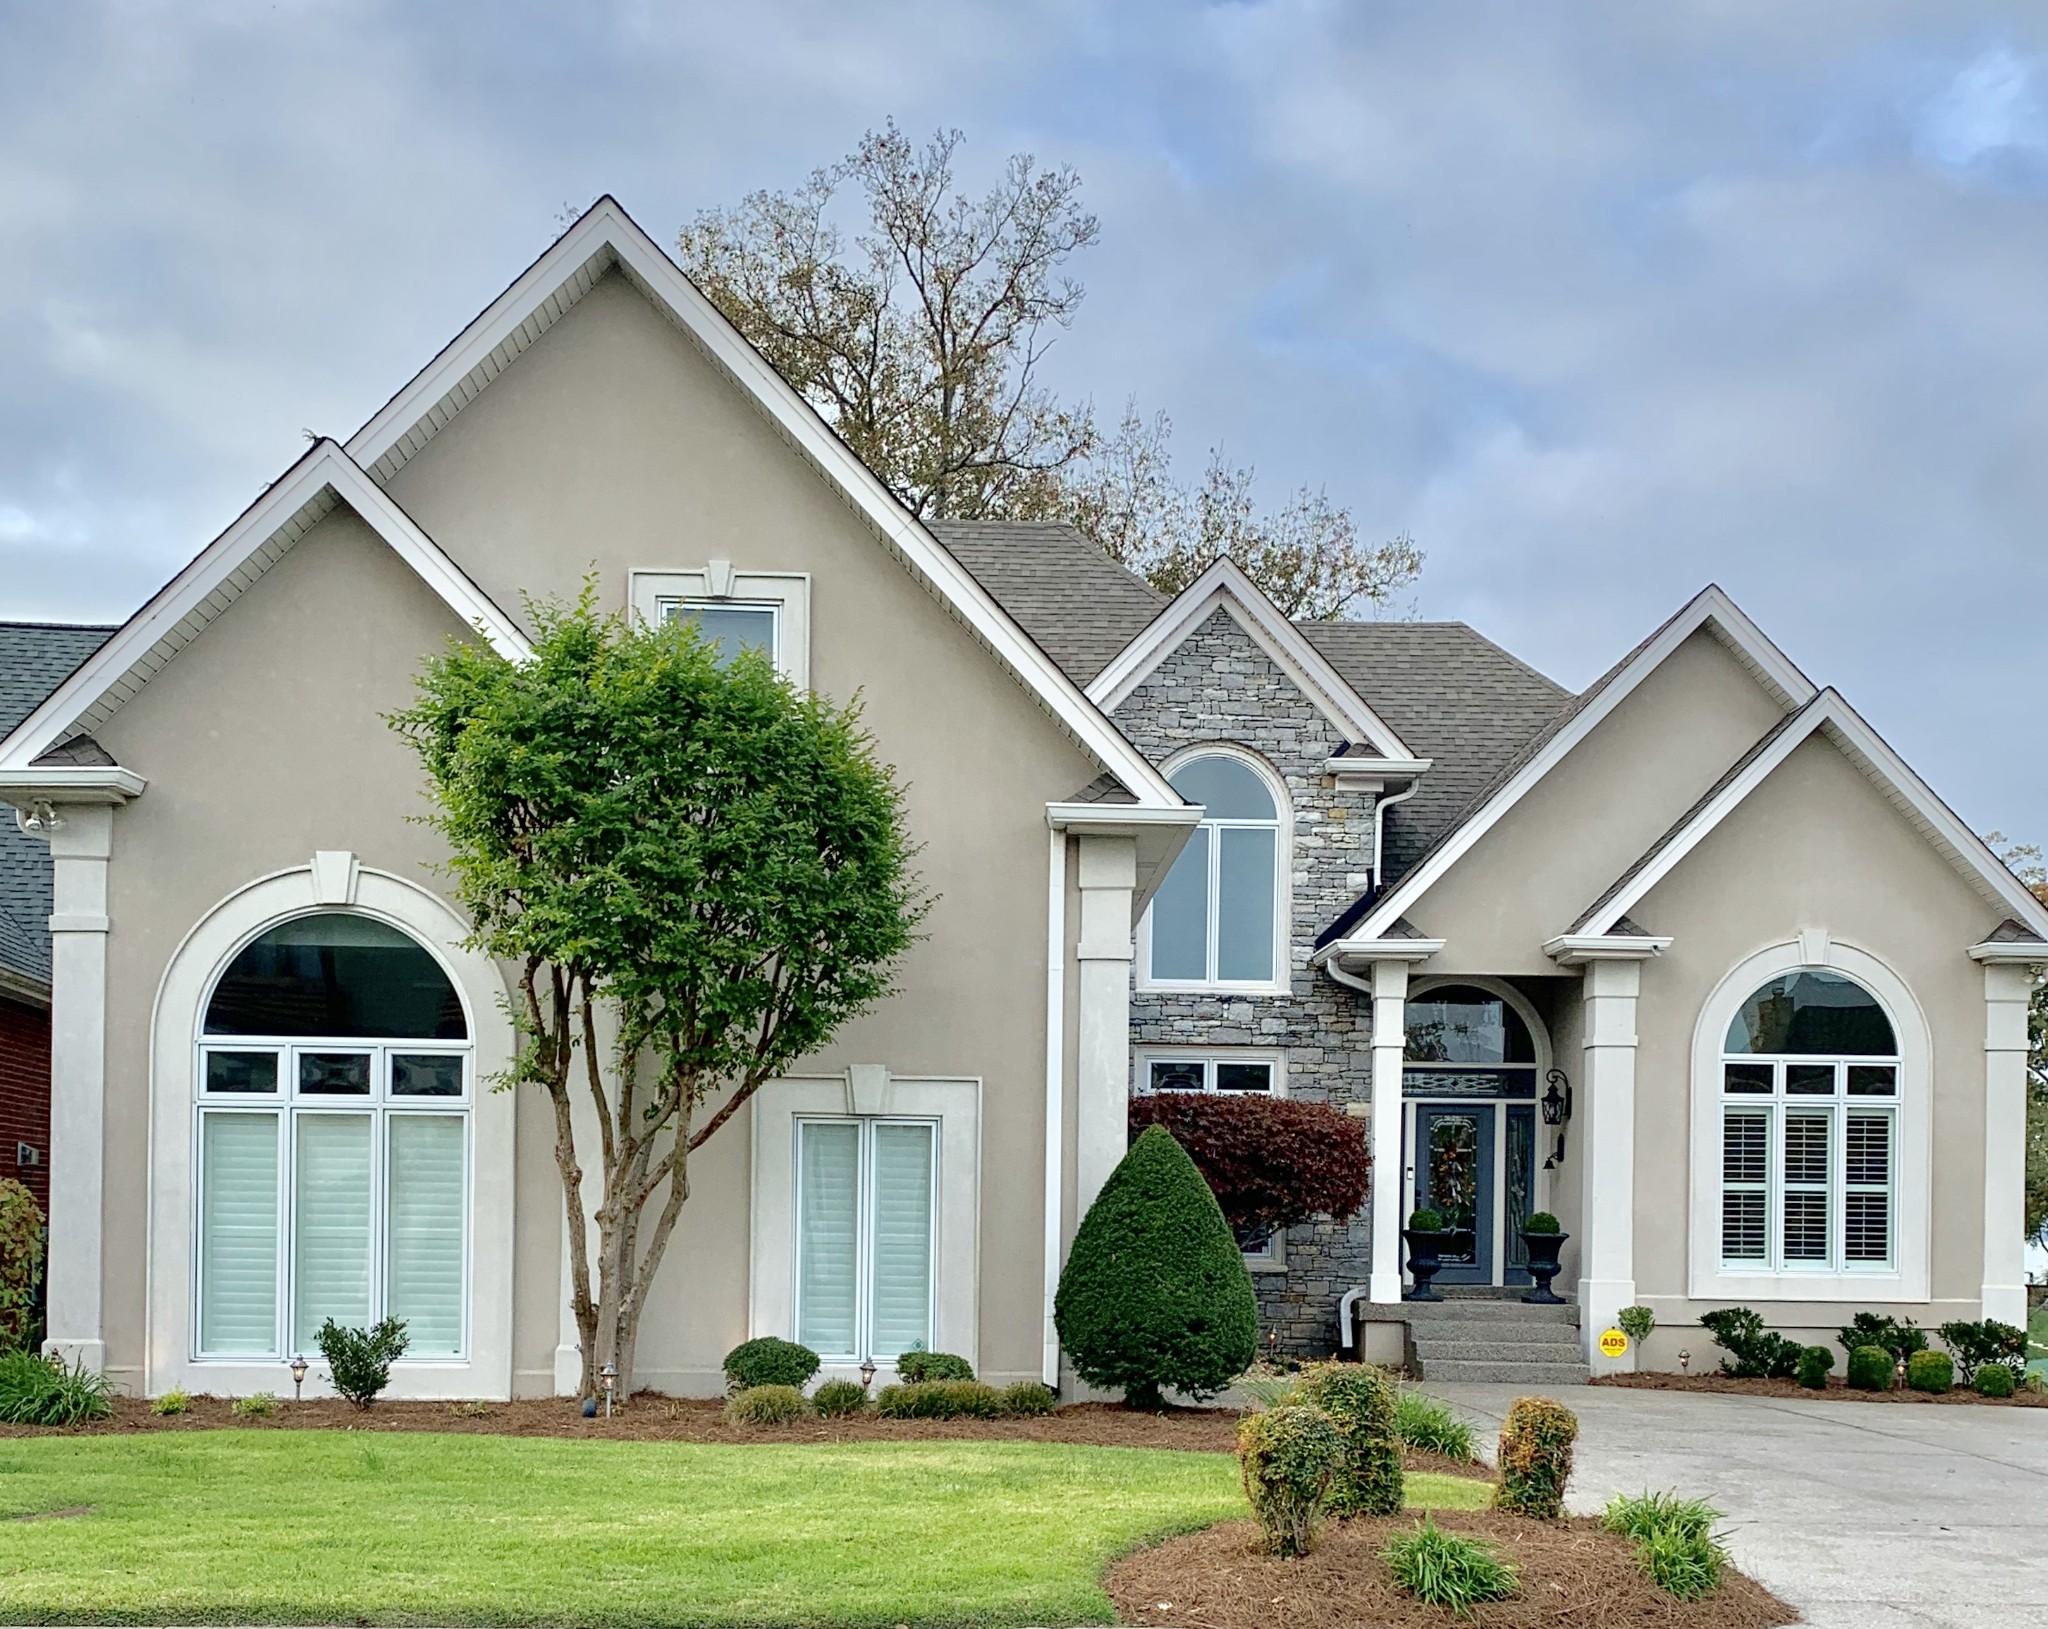 505 Sandy Cv Property Photo - Old Hickory, TN real estate listing